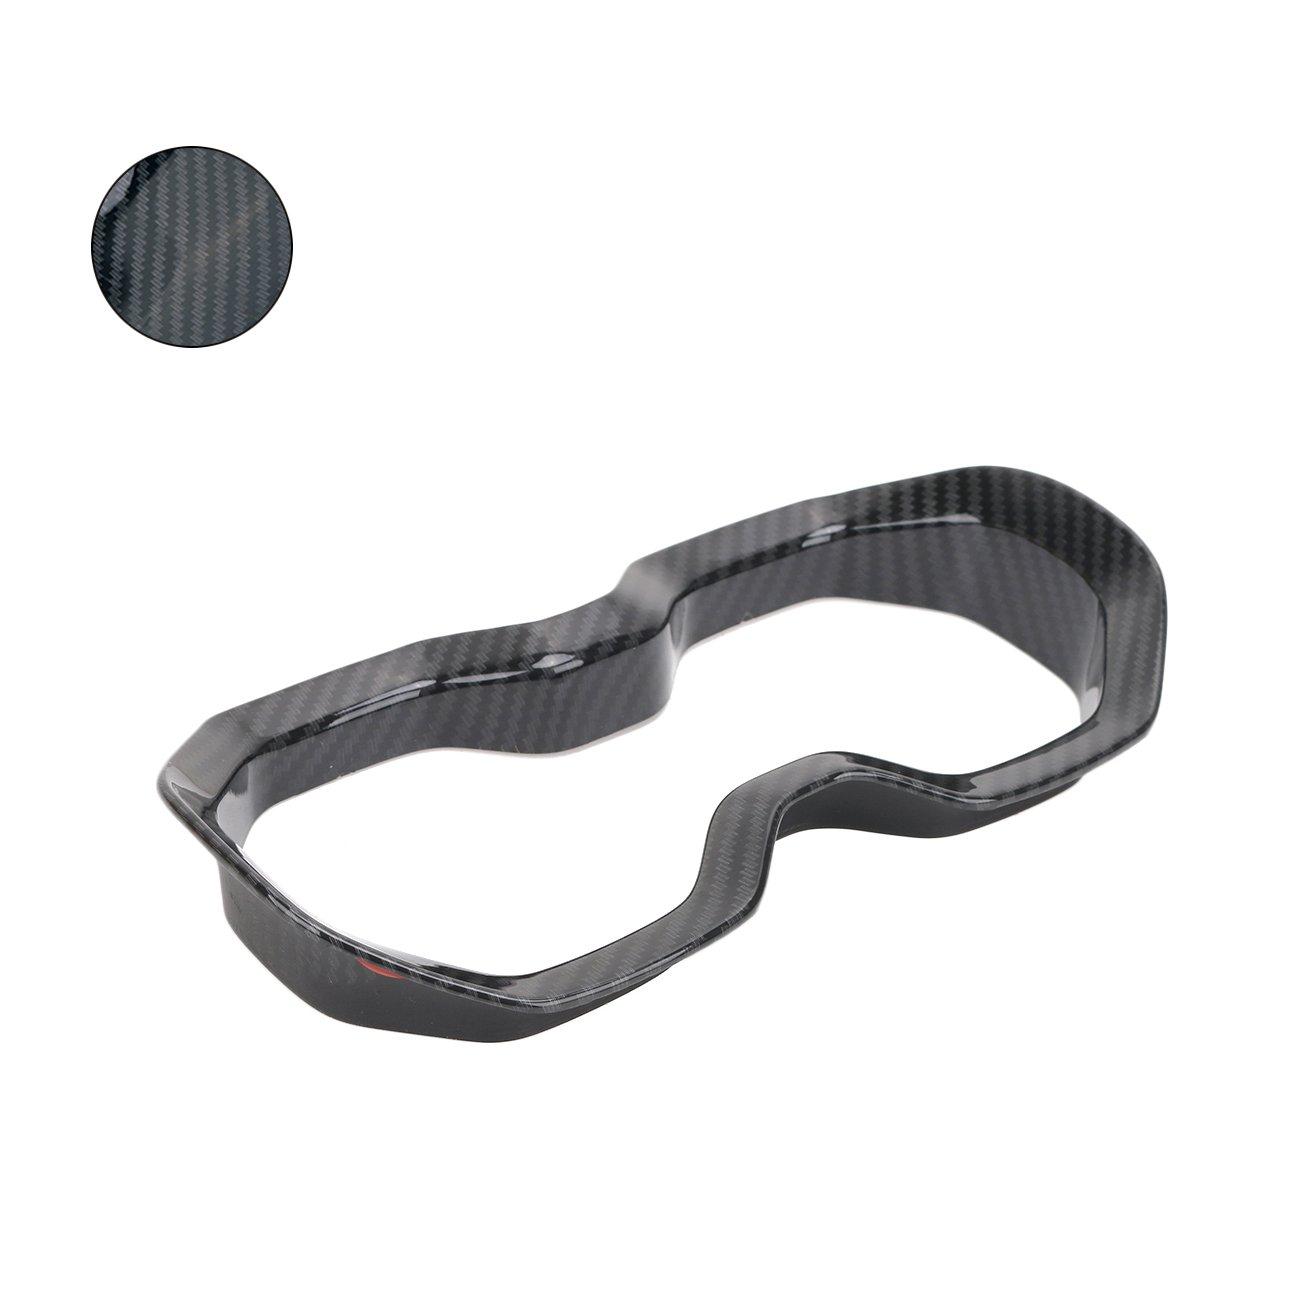 2 piezas Carcasa Cover Carbon Black No para Renegade 2018 Tablero de instrumentos Air Vent Frame Renegade 2015-2017